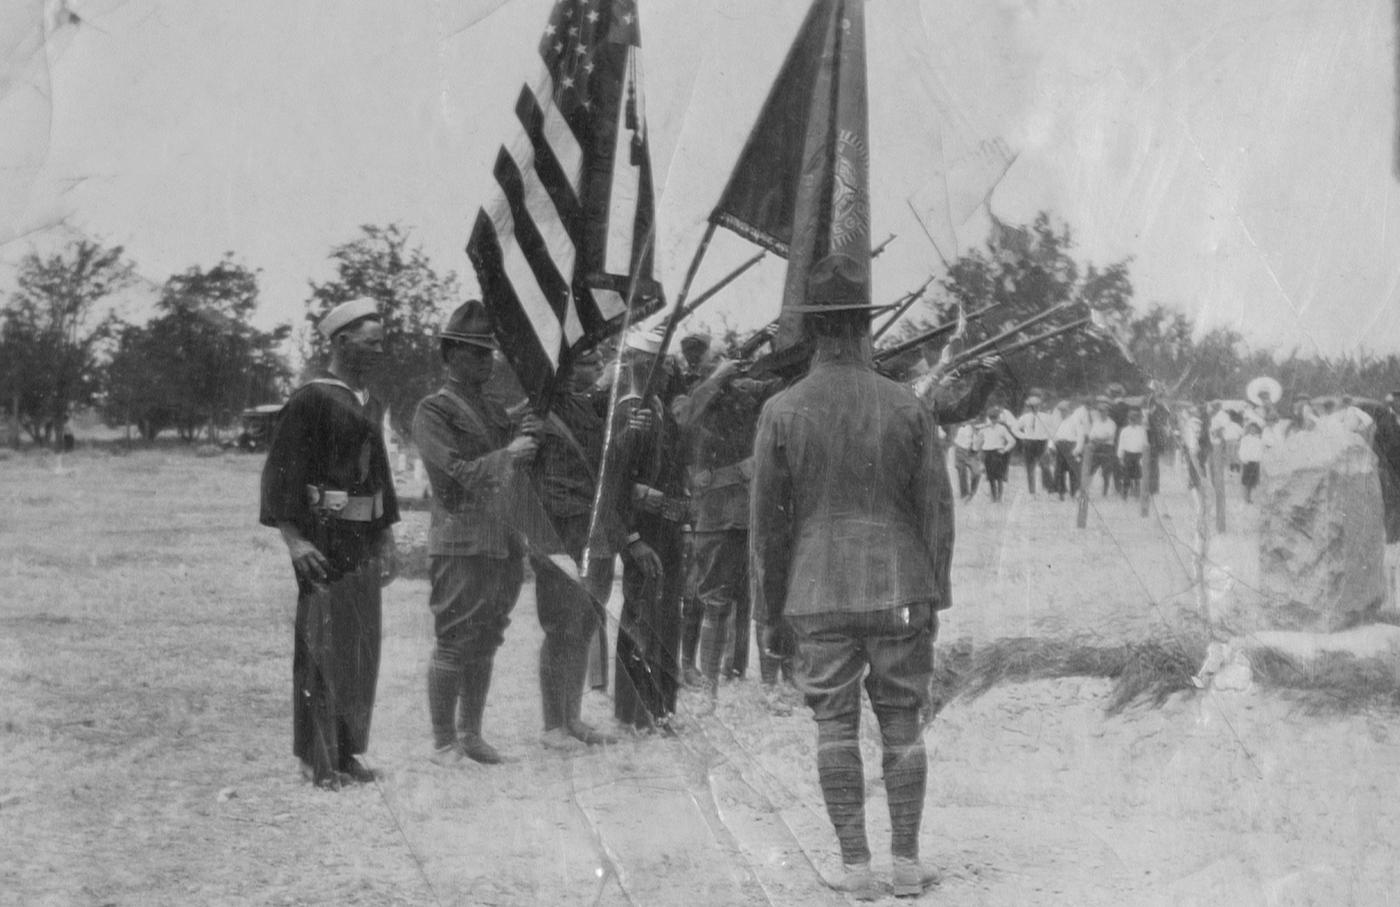 Veterans, non-veterans alike remember Memorial Day